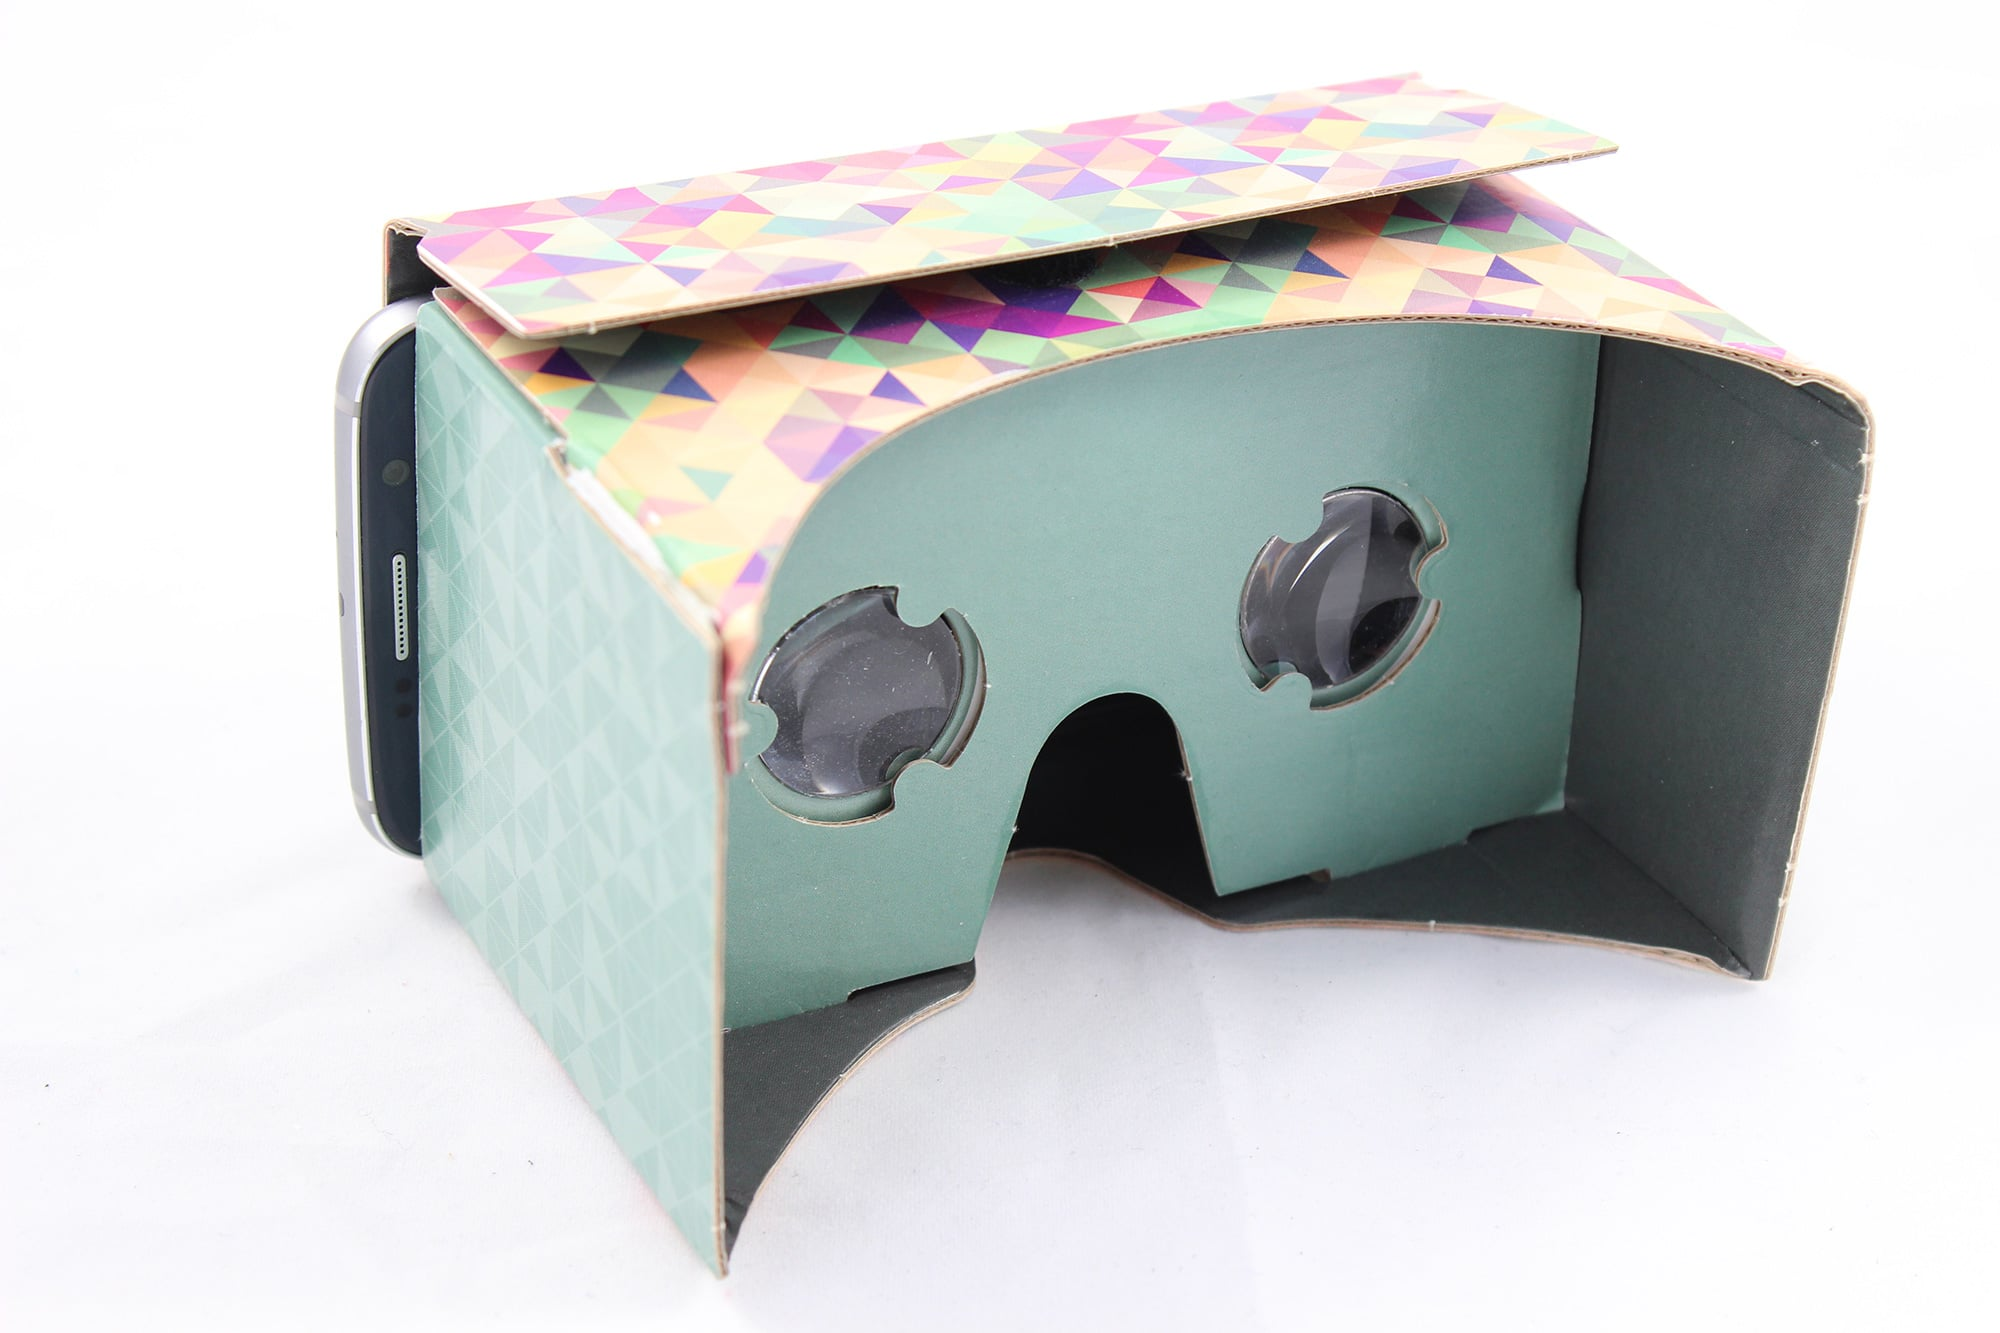 testbericht pop cardboard von mr cardboard vr brille. Black Bedroom Furniture Sets. Home Design Ideas